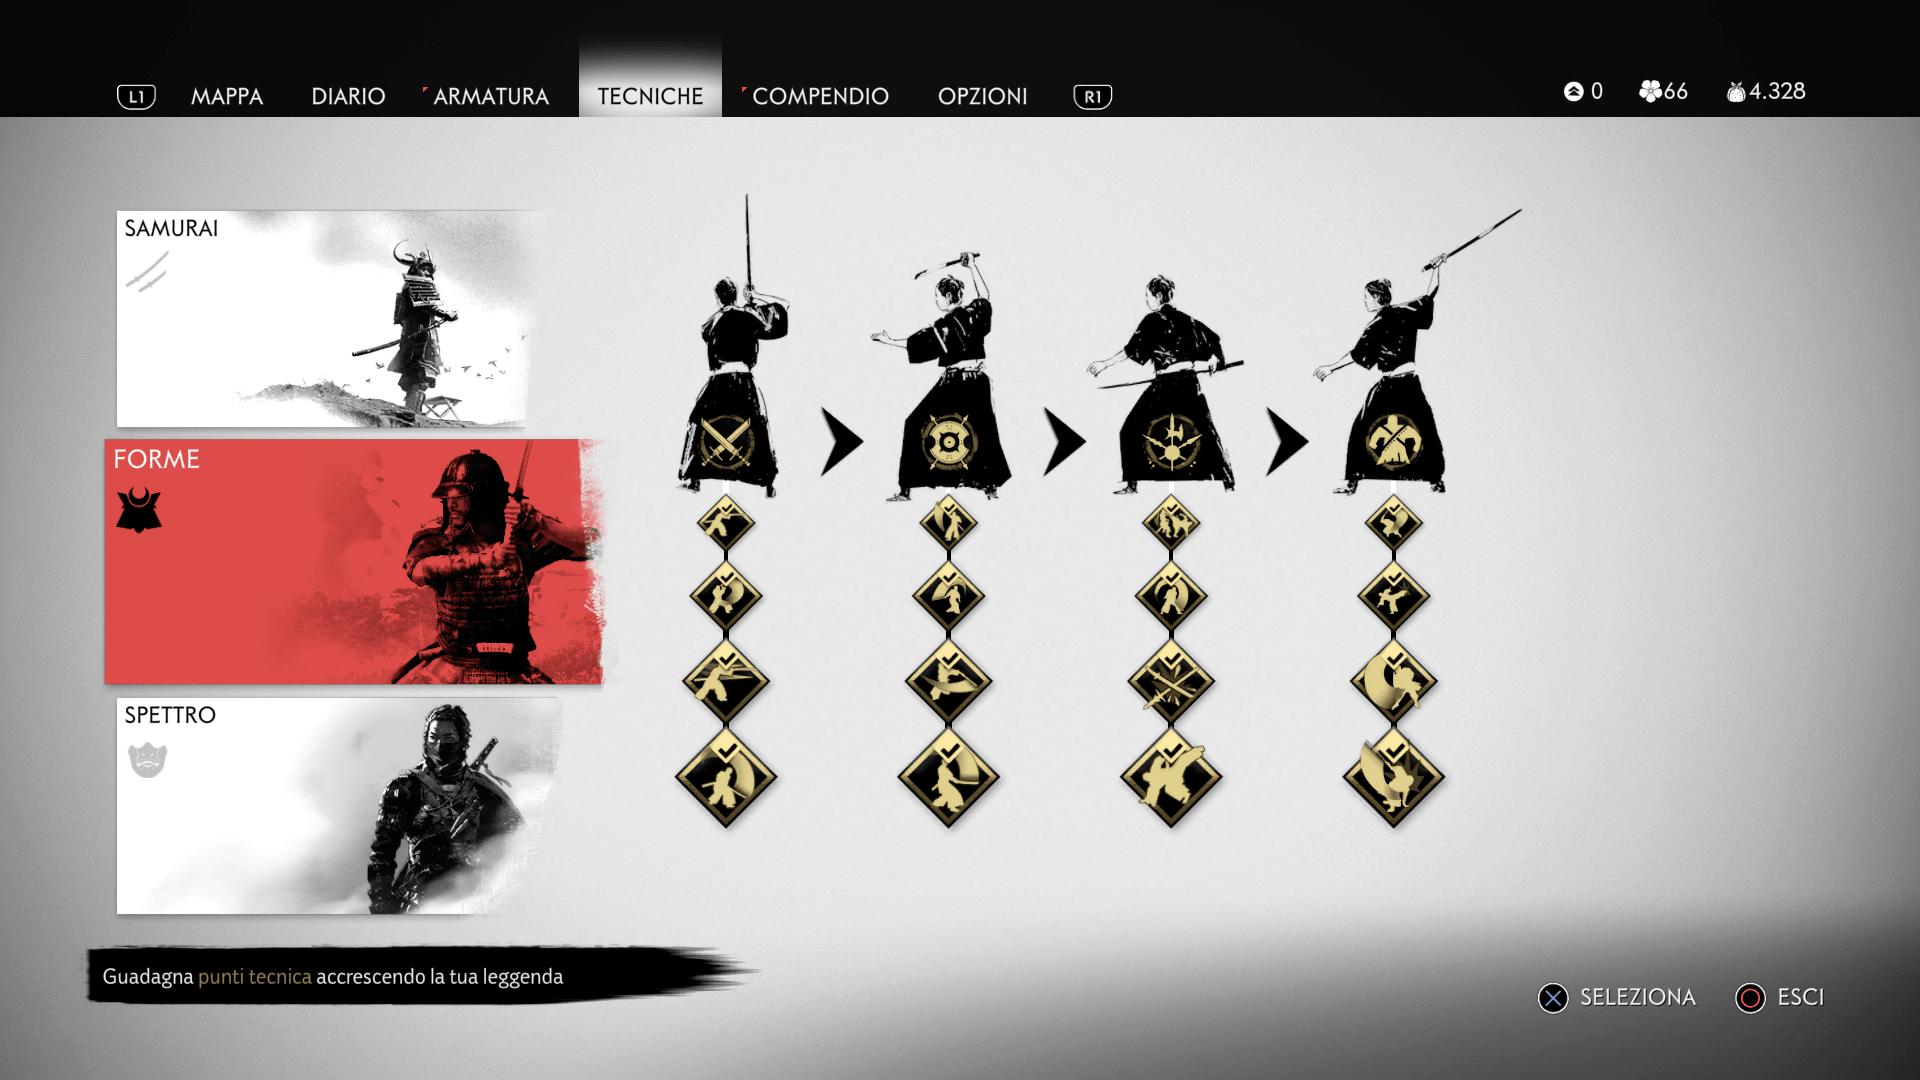 Giappone Feudale: 4 Videogiochi Più Caratteristici 15 - Hynerd.it